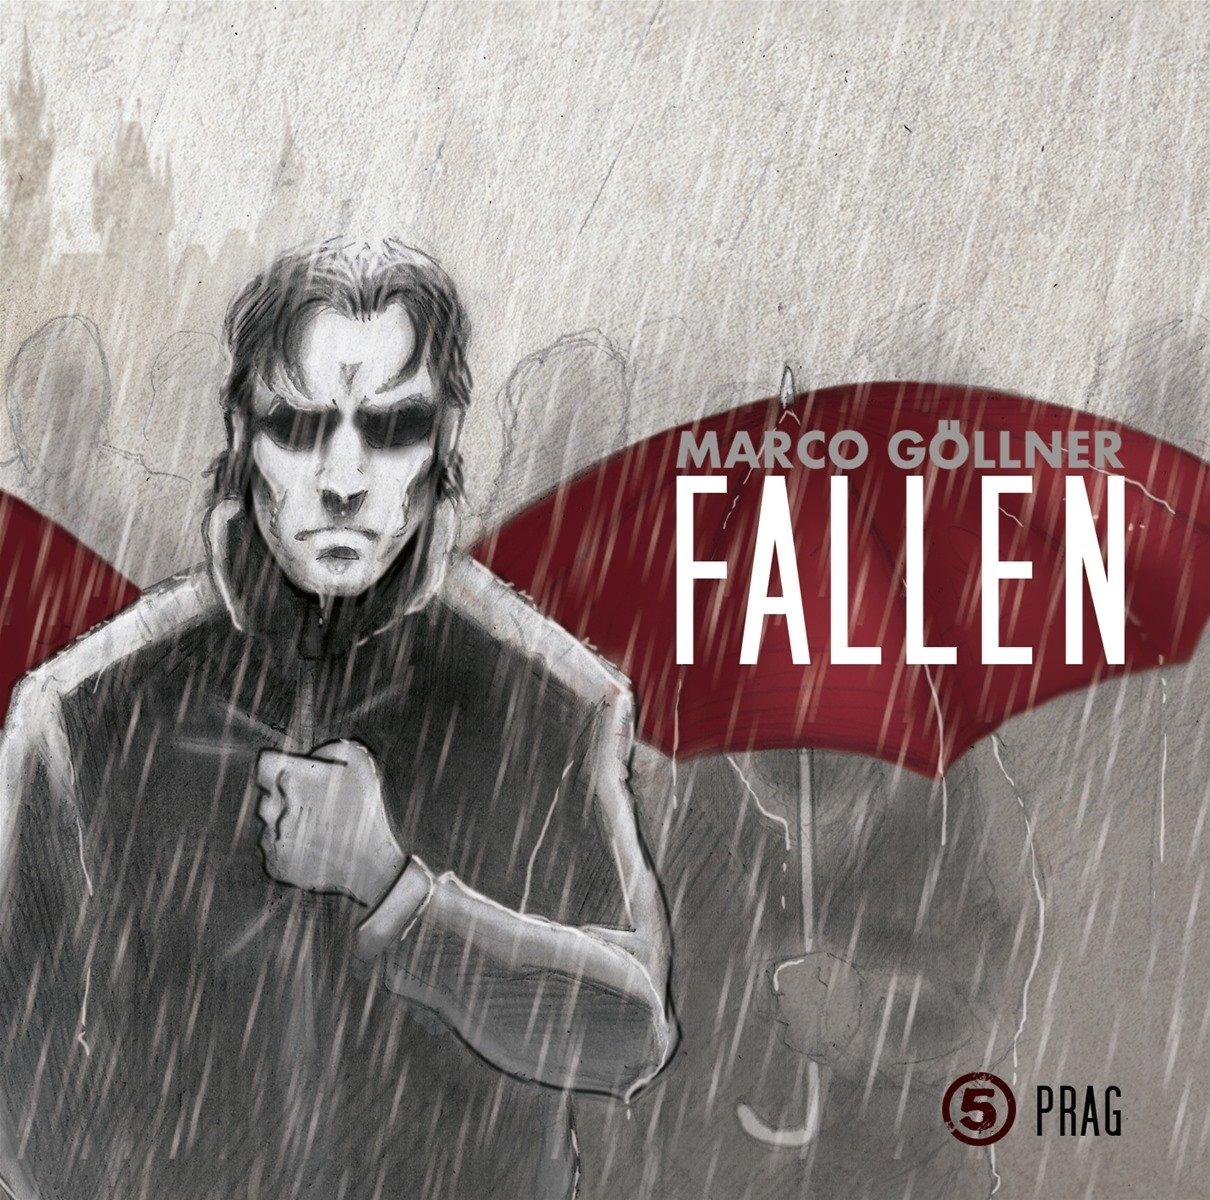 Fallen 05 - Prag - Marco Göllner: Amazon.de: Musik